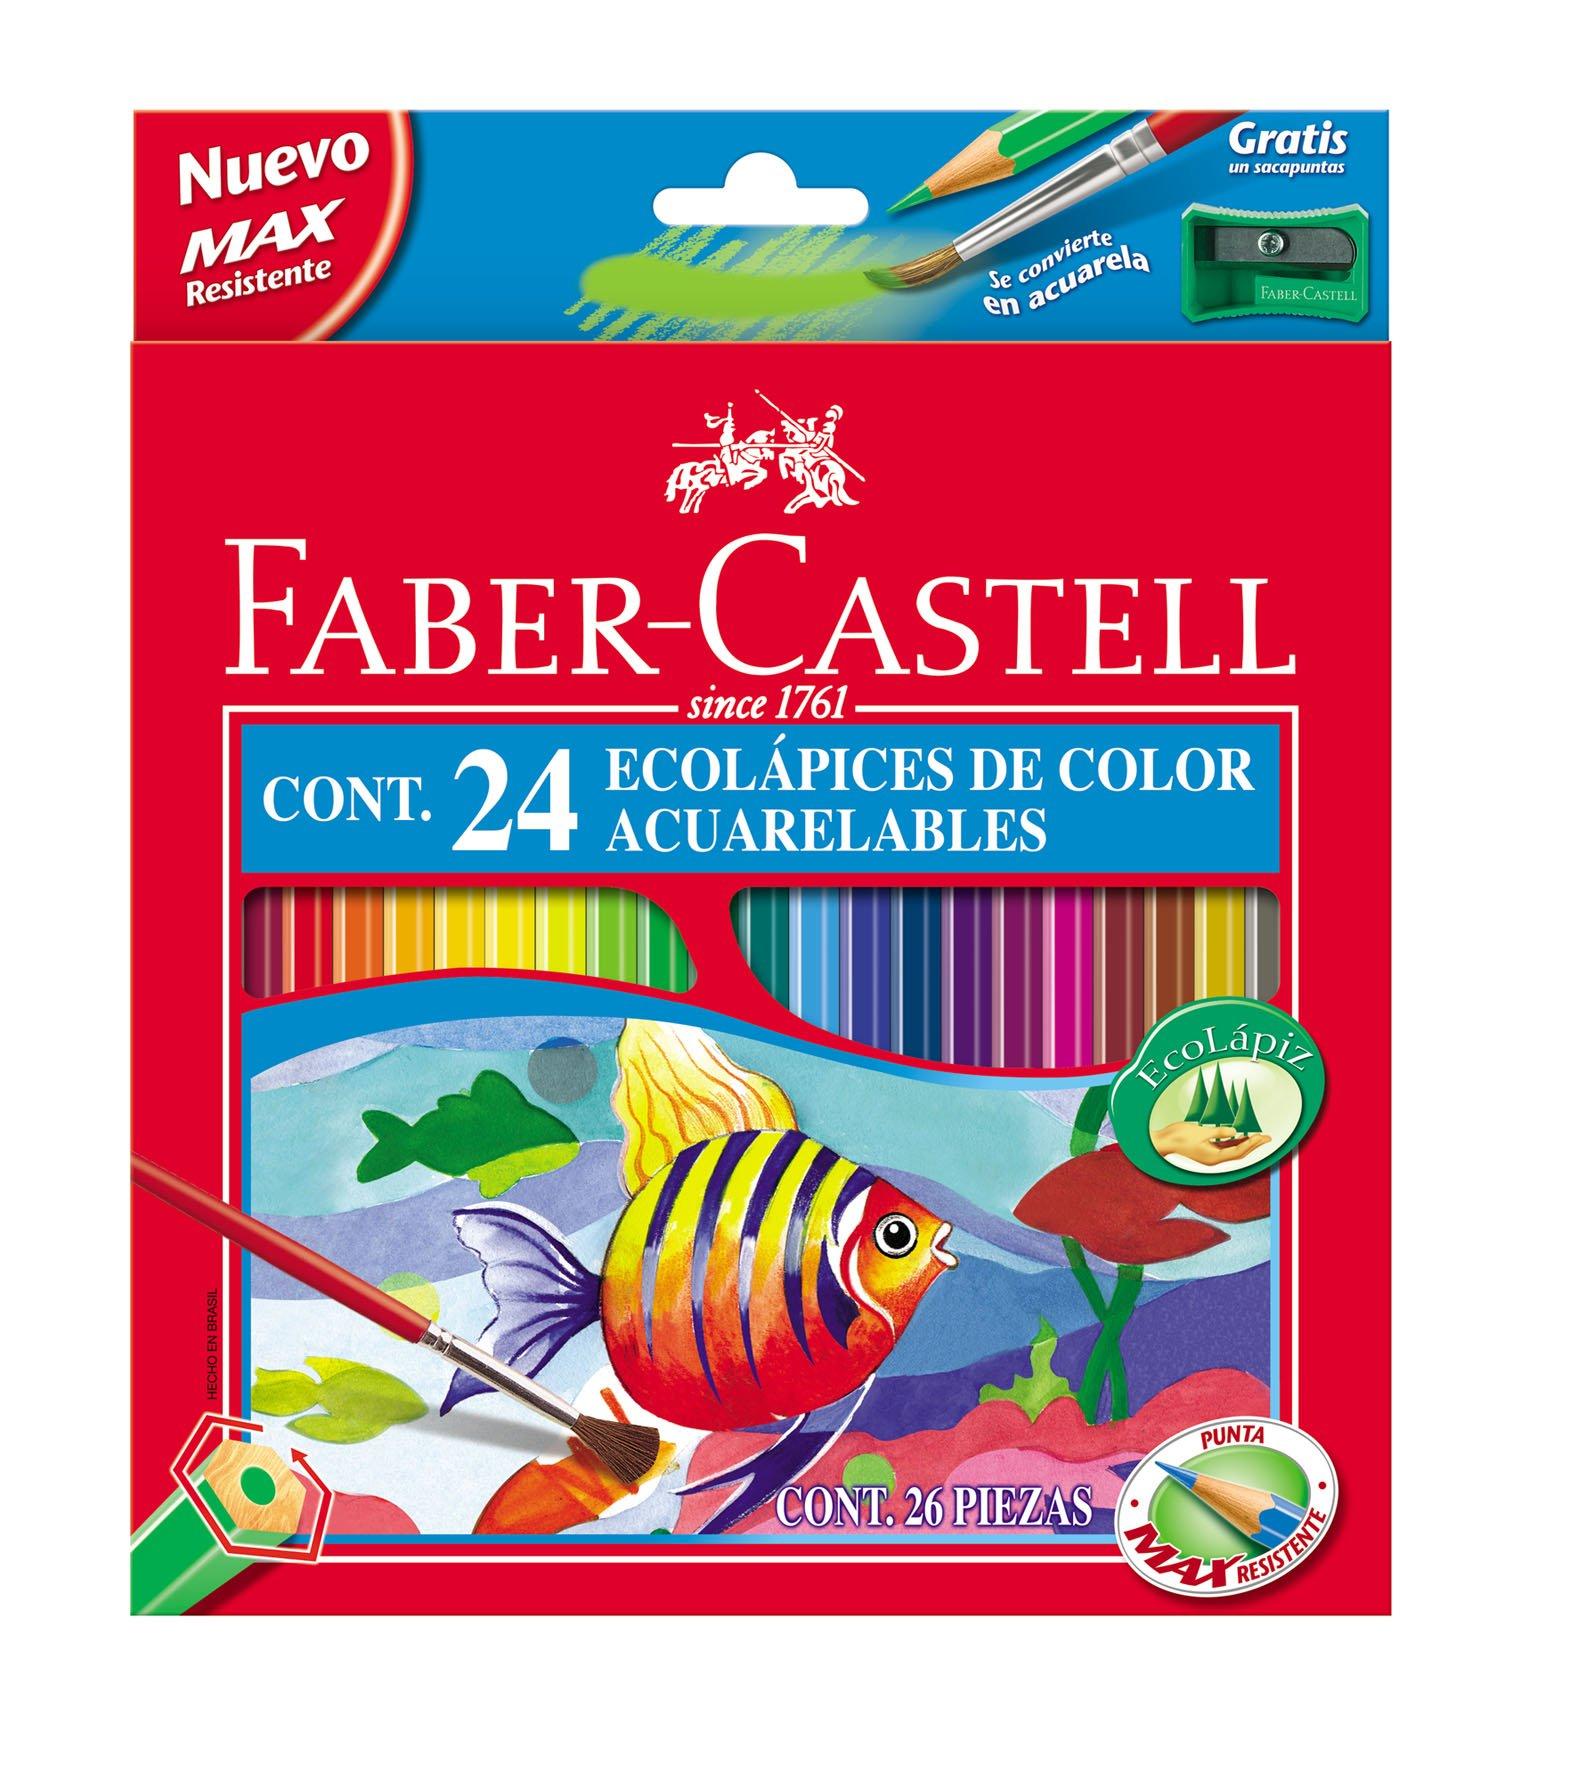 Faber-Castell 120224 – Estuche de 24 ecolápices de color acuarelable, 1 pincel y afilalápices de regalo